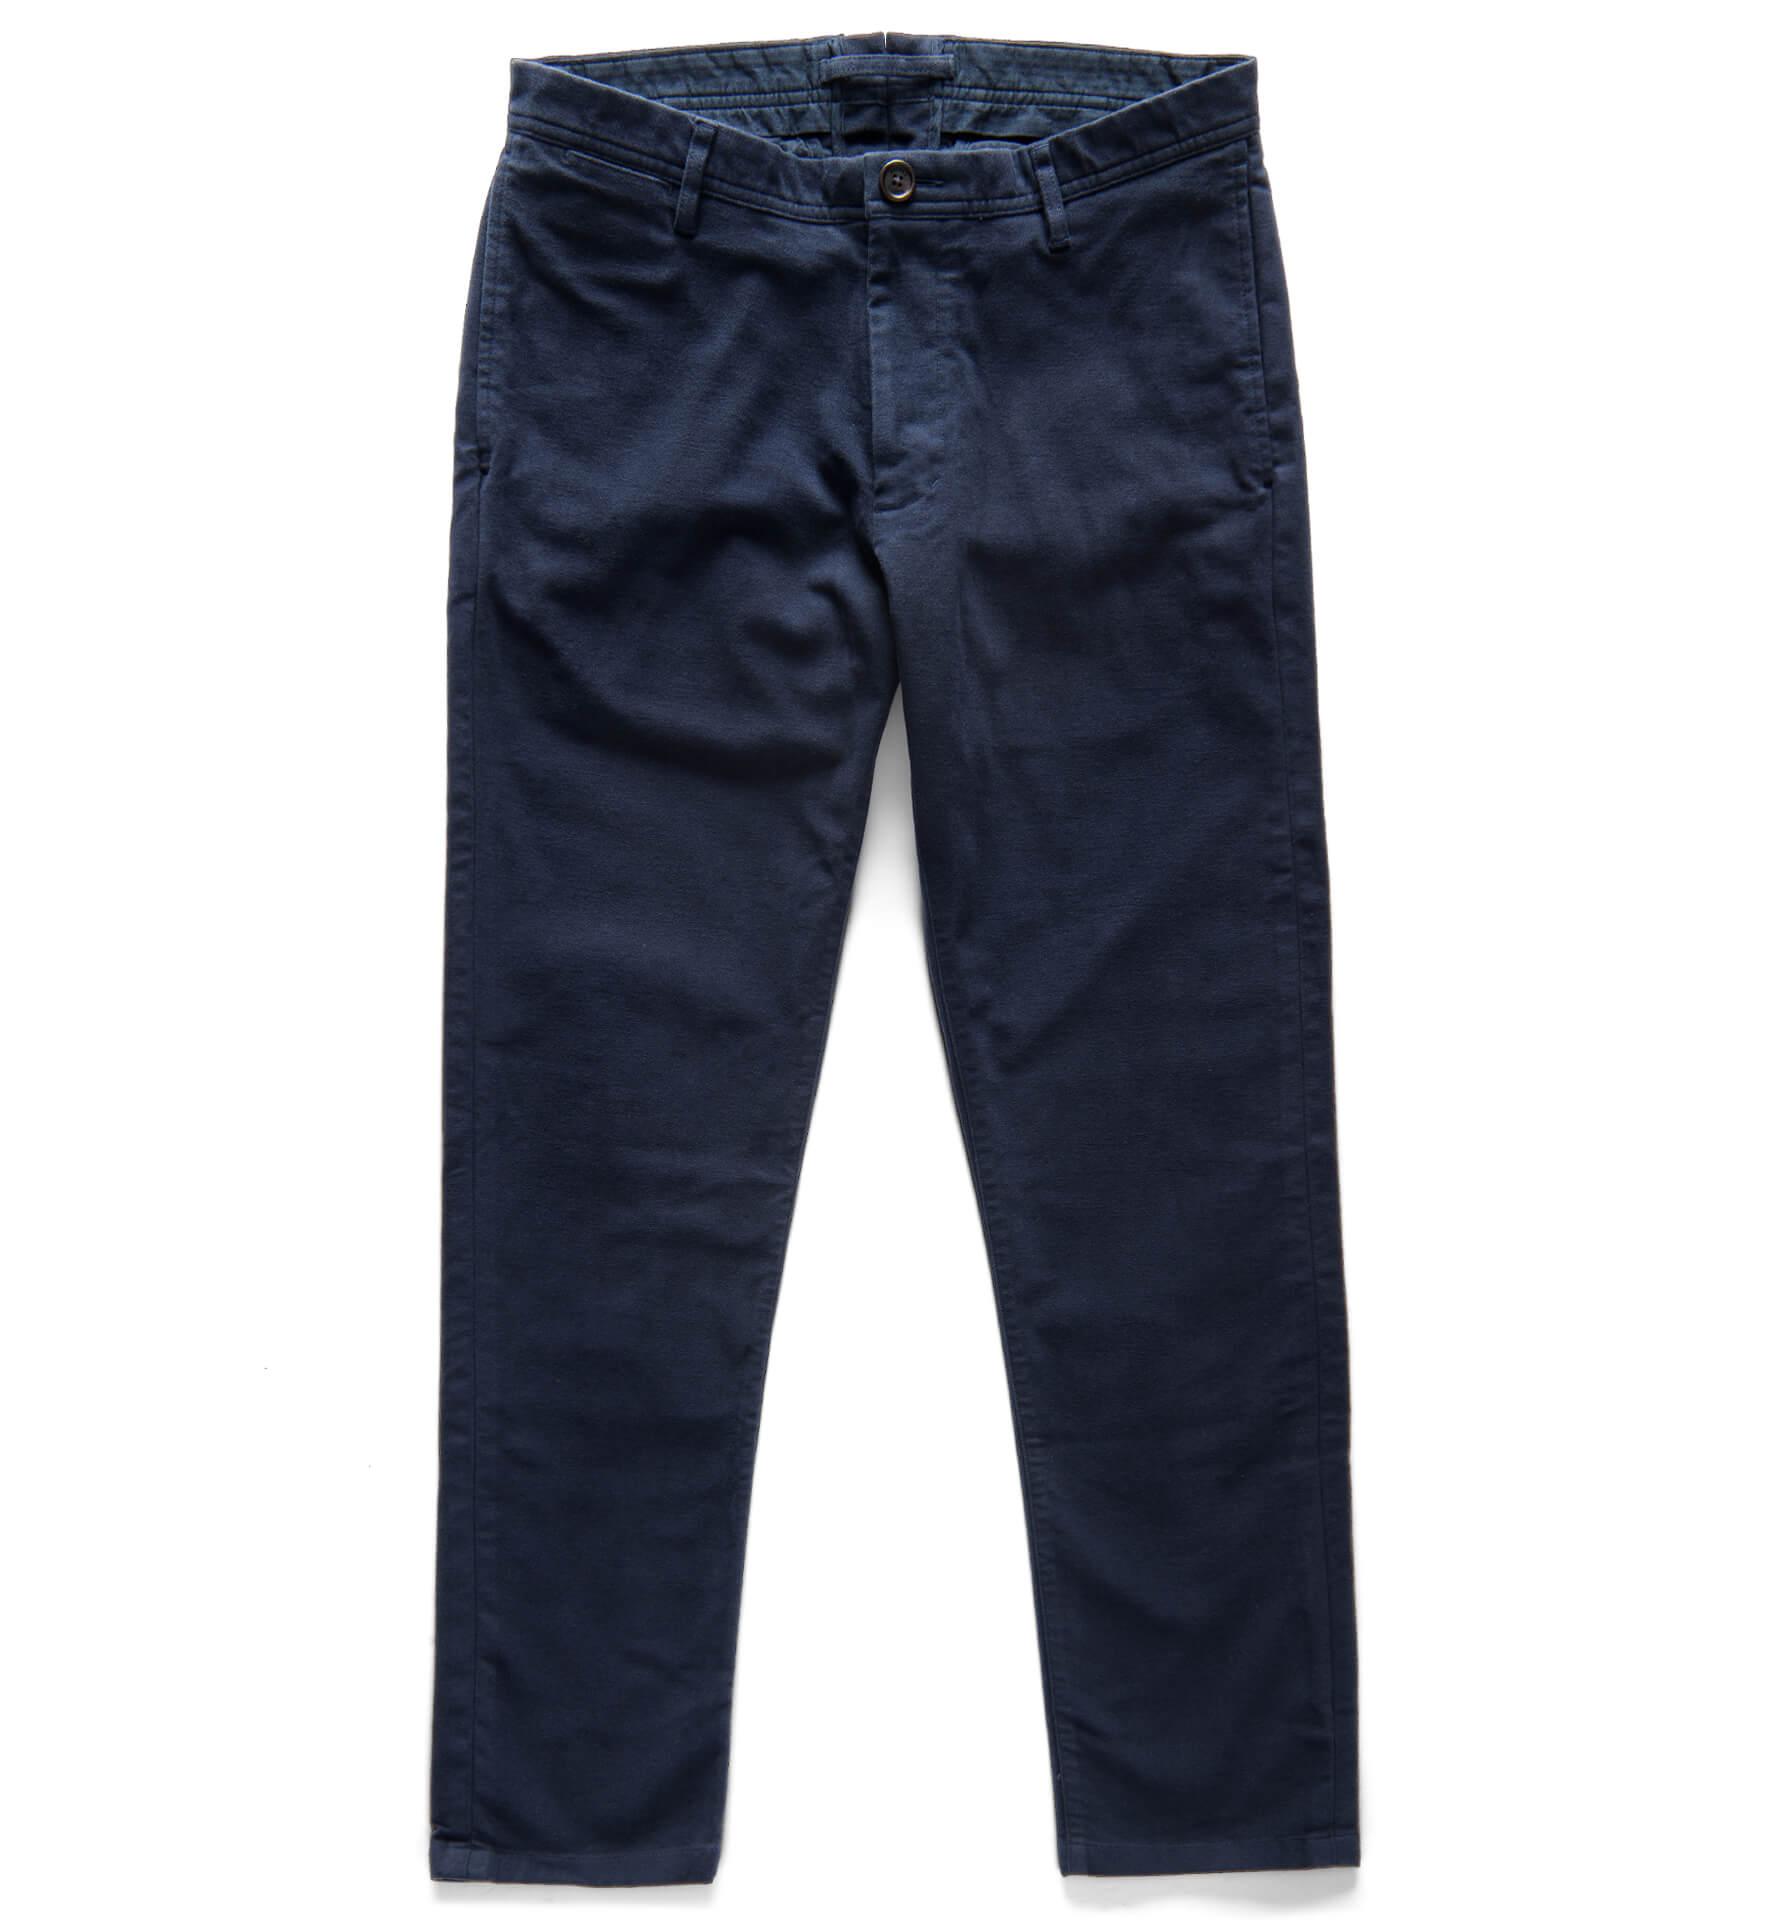 Zoom Image of Bowery Navy Moleskin Pants